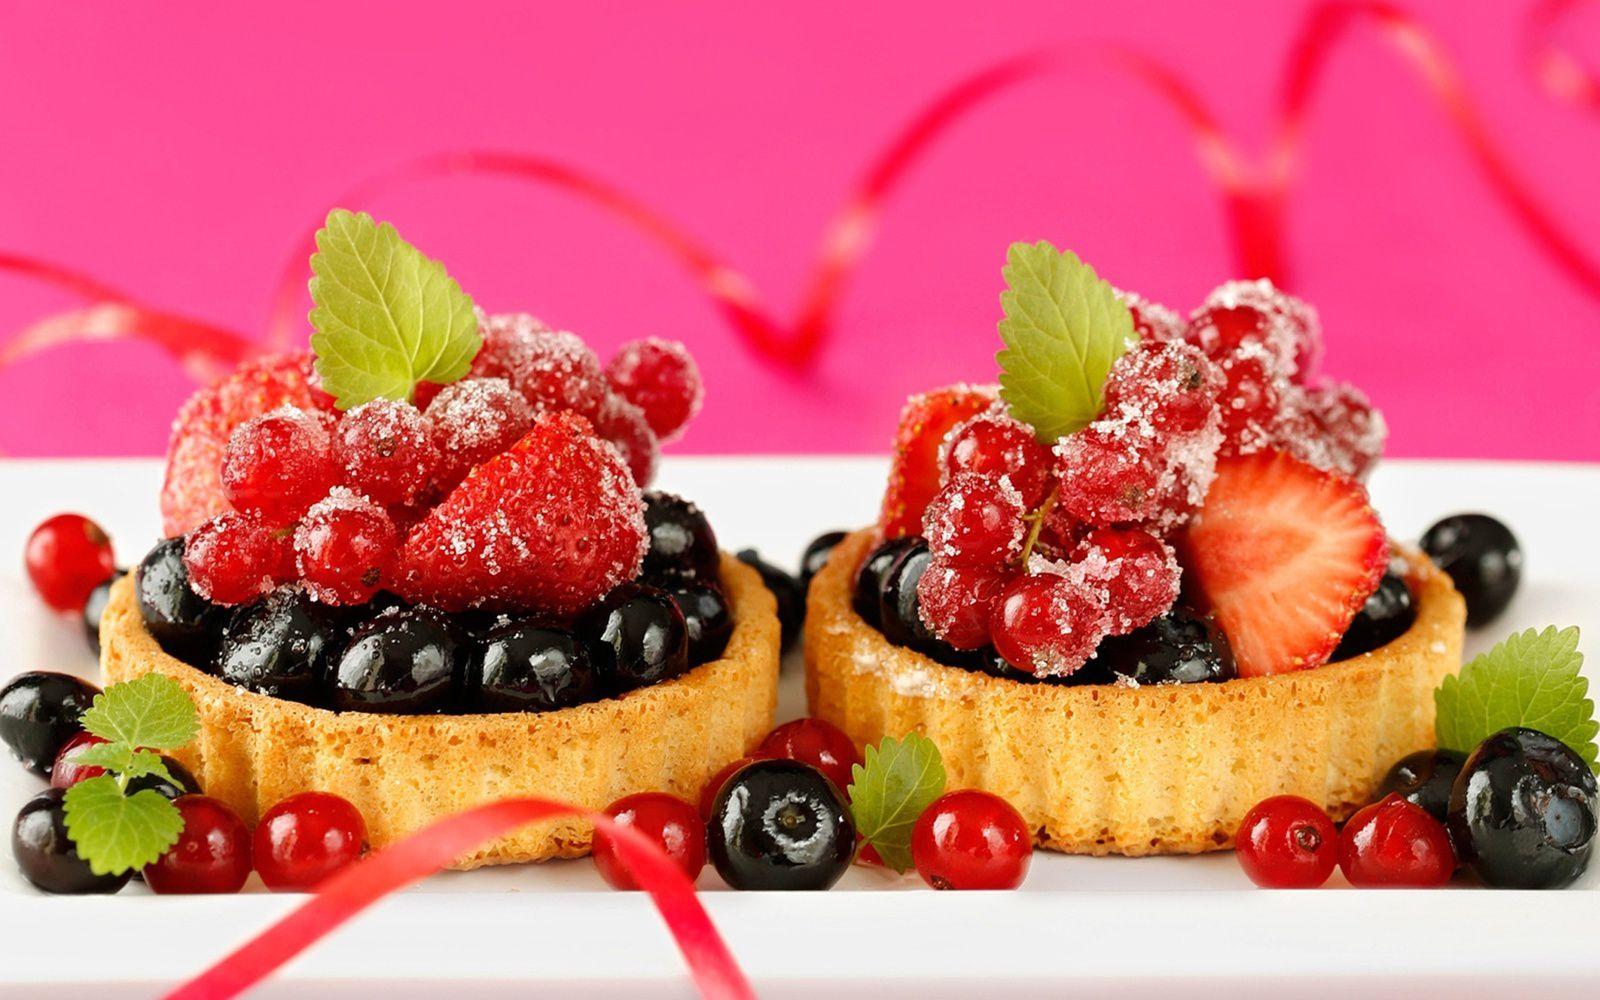 Tartelettes - Fruits - Fraises - Gourmandises - Wallpapers - HD